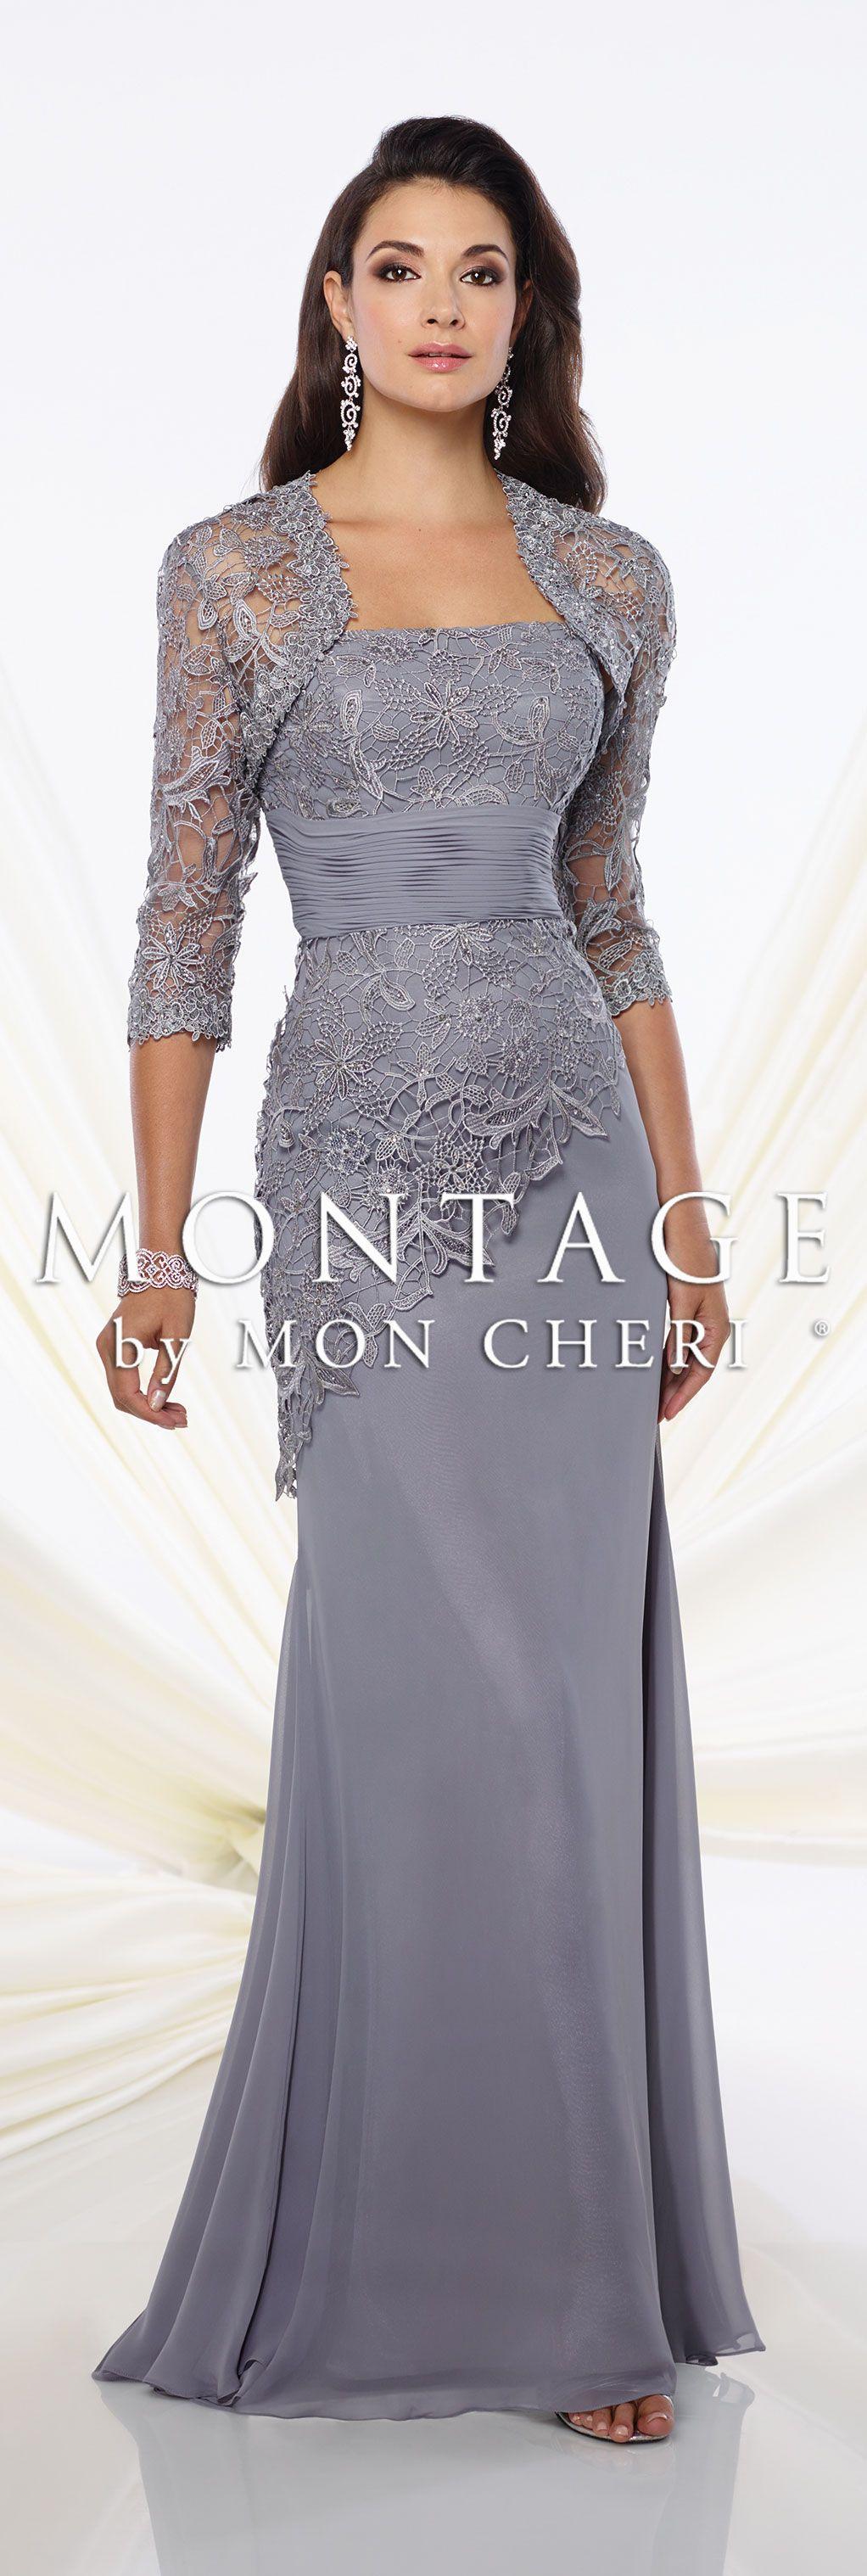 4f76ffed3e00 Montage by Mon Cheri Spring 2016 - Style No. 116944  eveninggowns Monica  Earrings www.davidtuteraembellish.com